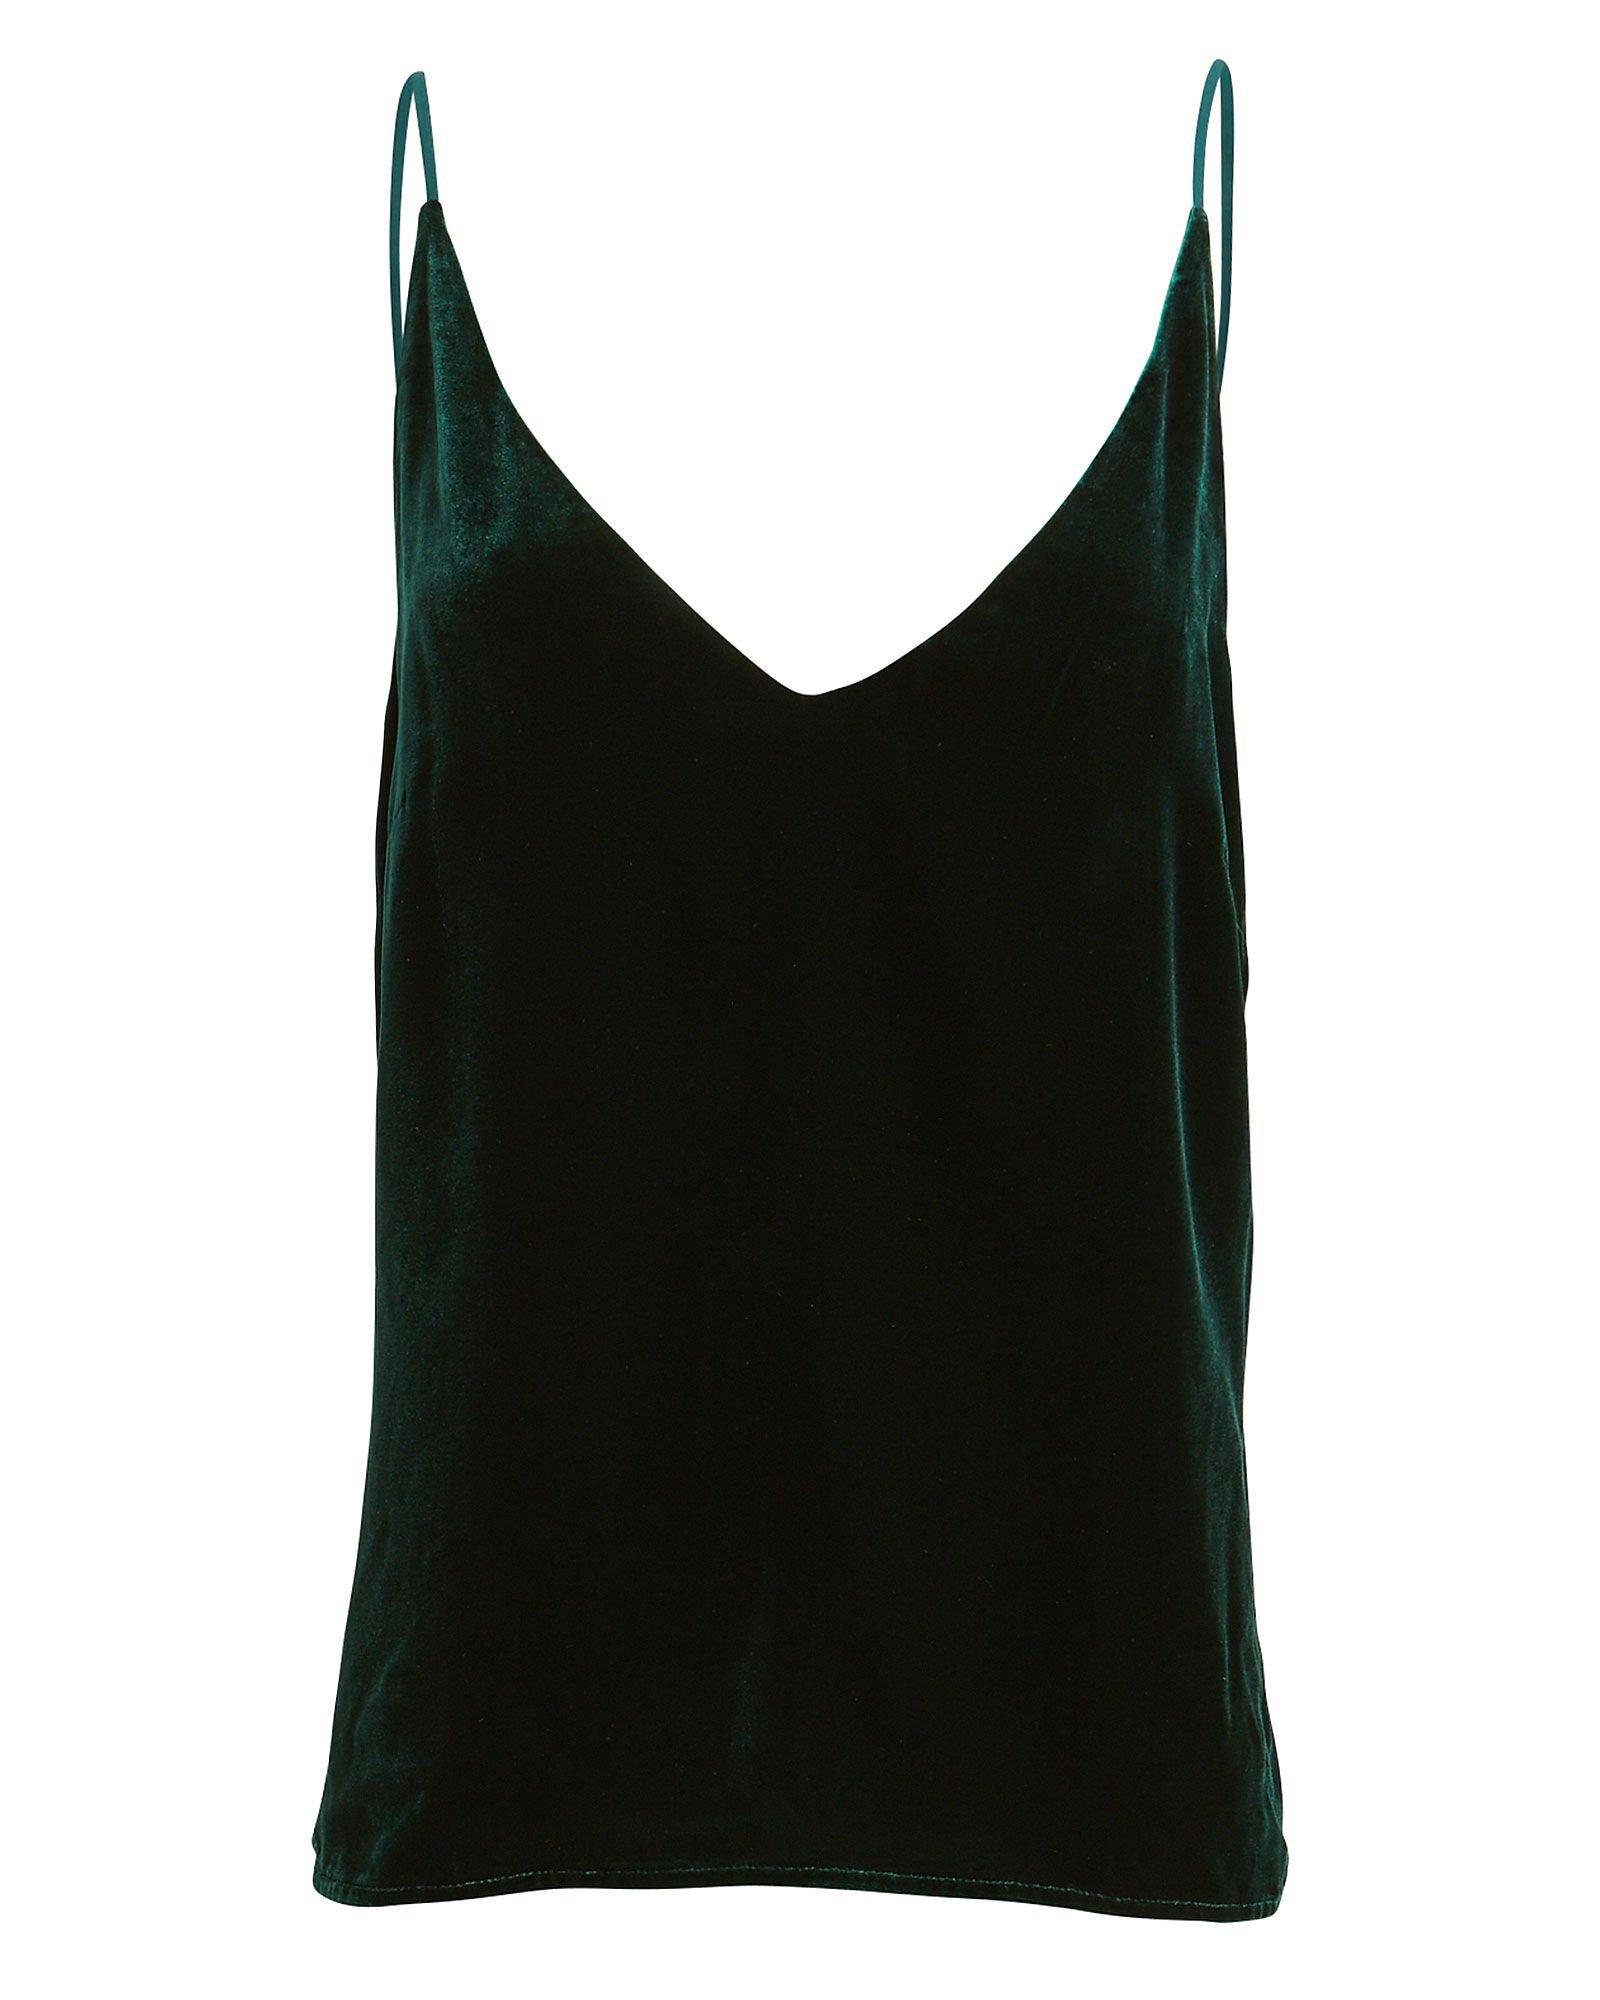 L'Agence   Gabriella Velvet Camisole   INTERMIX®